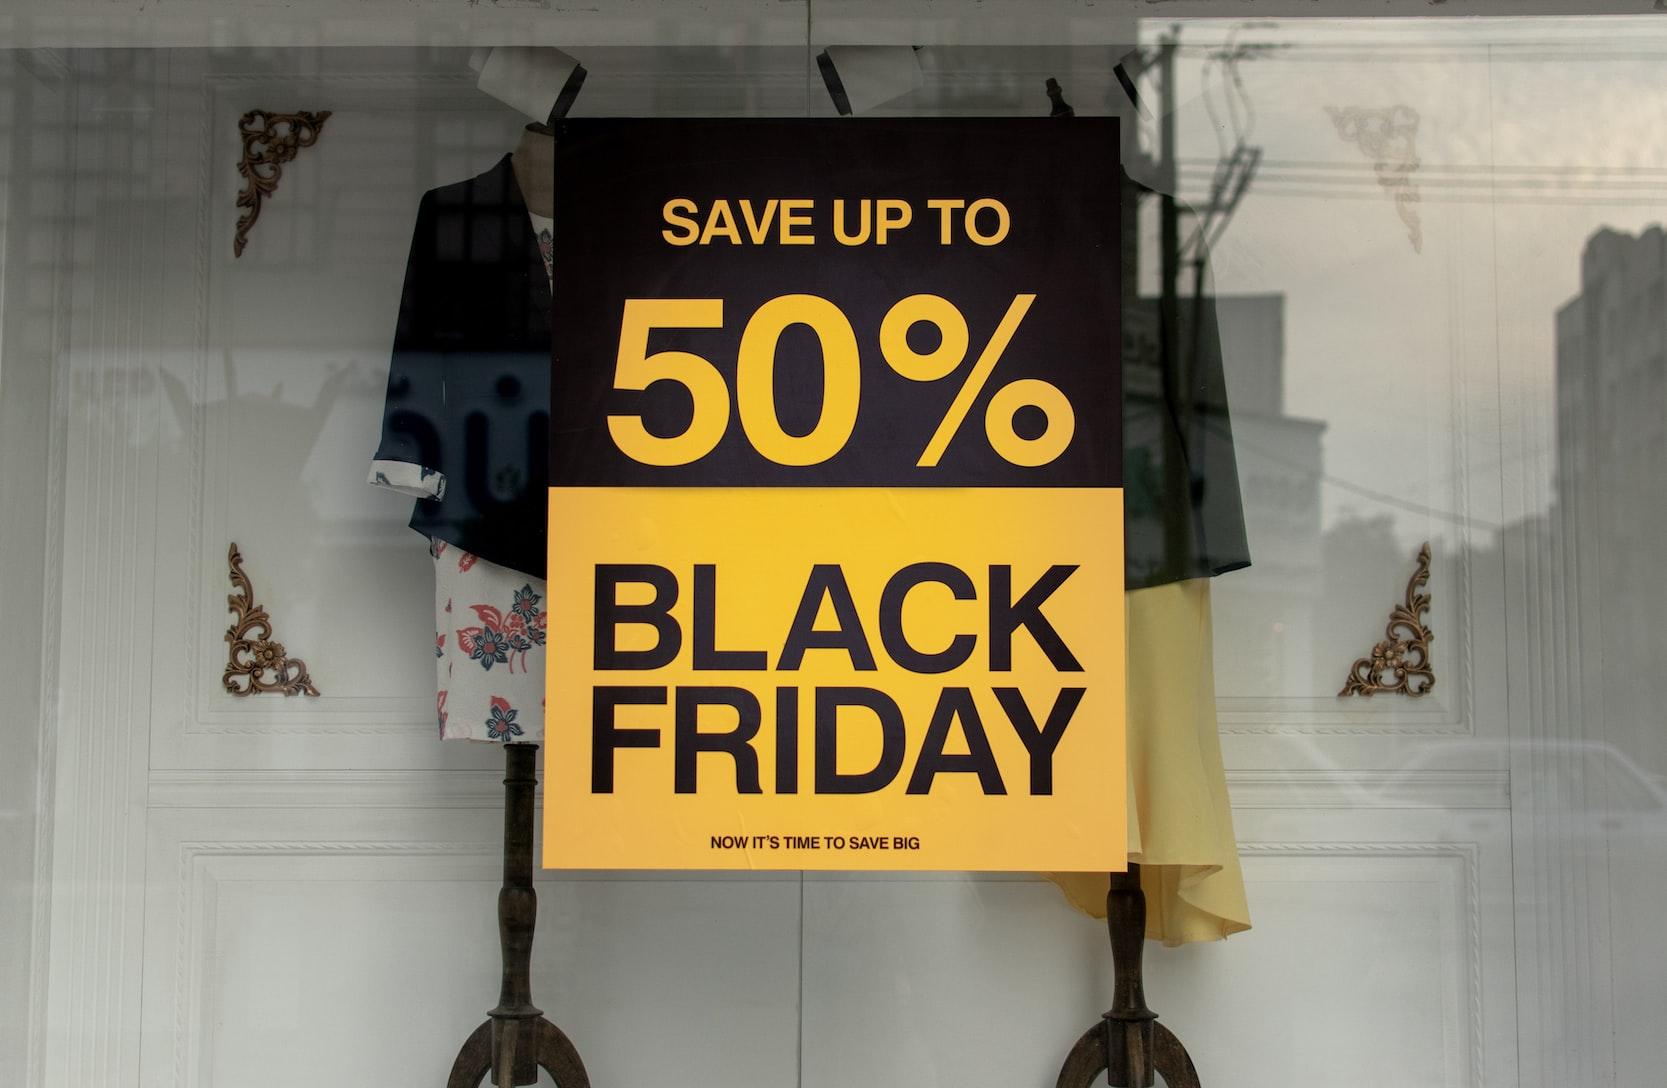 Black Friday Sale image